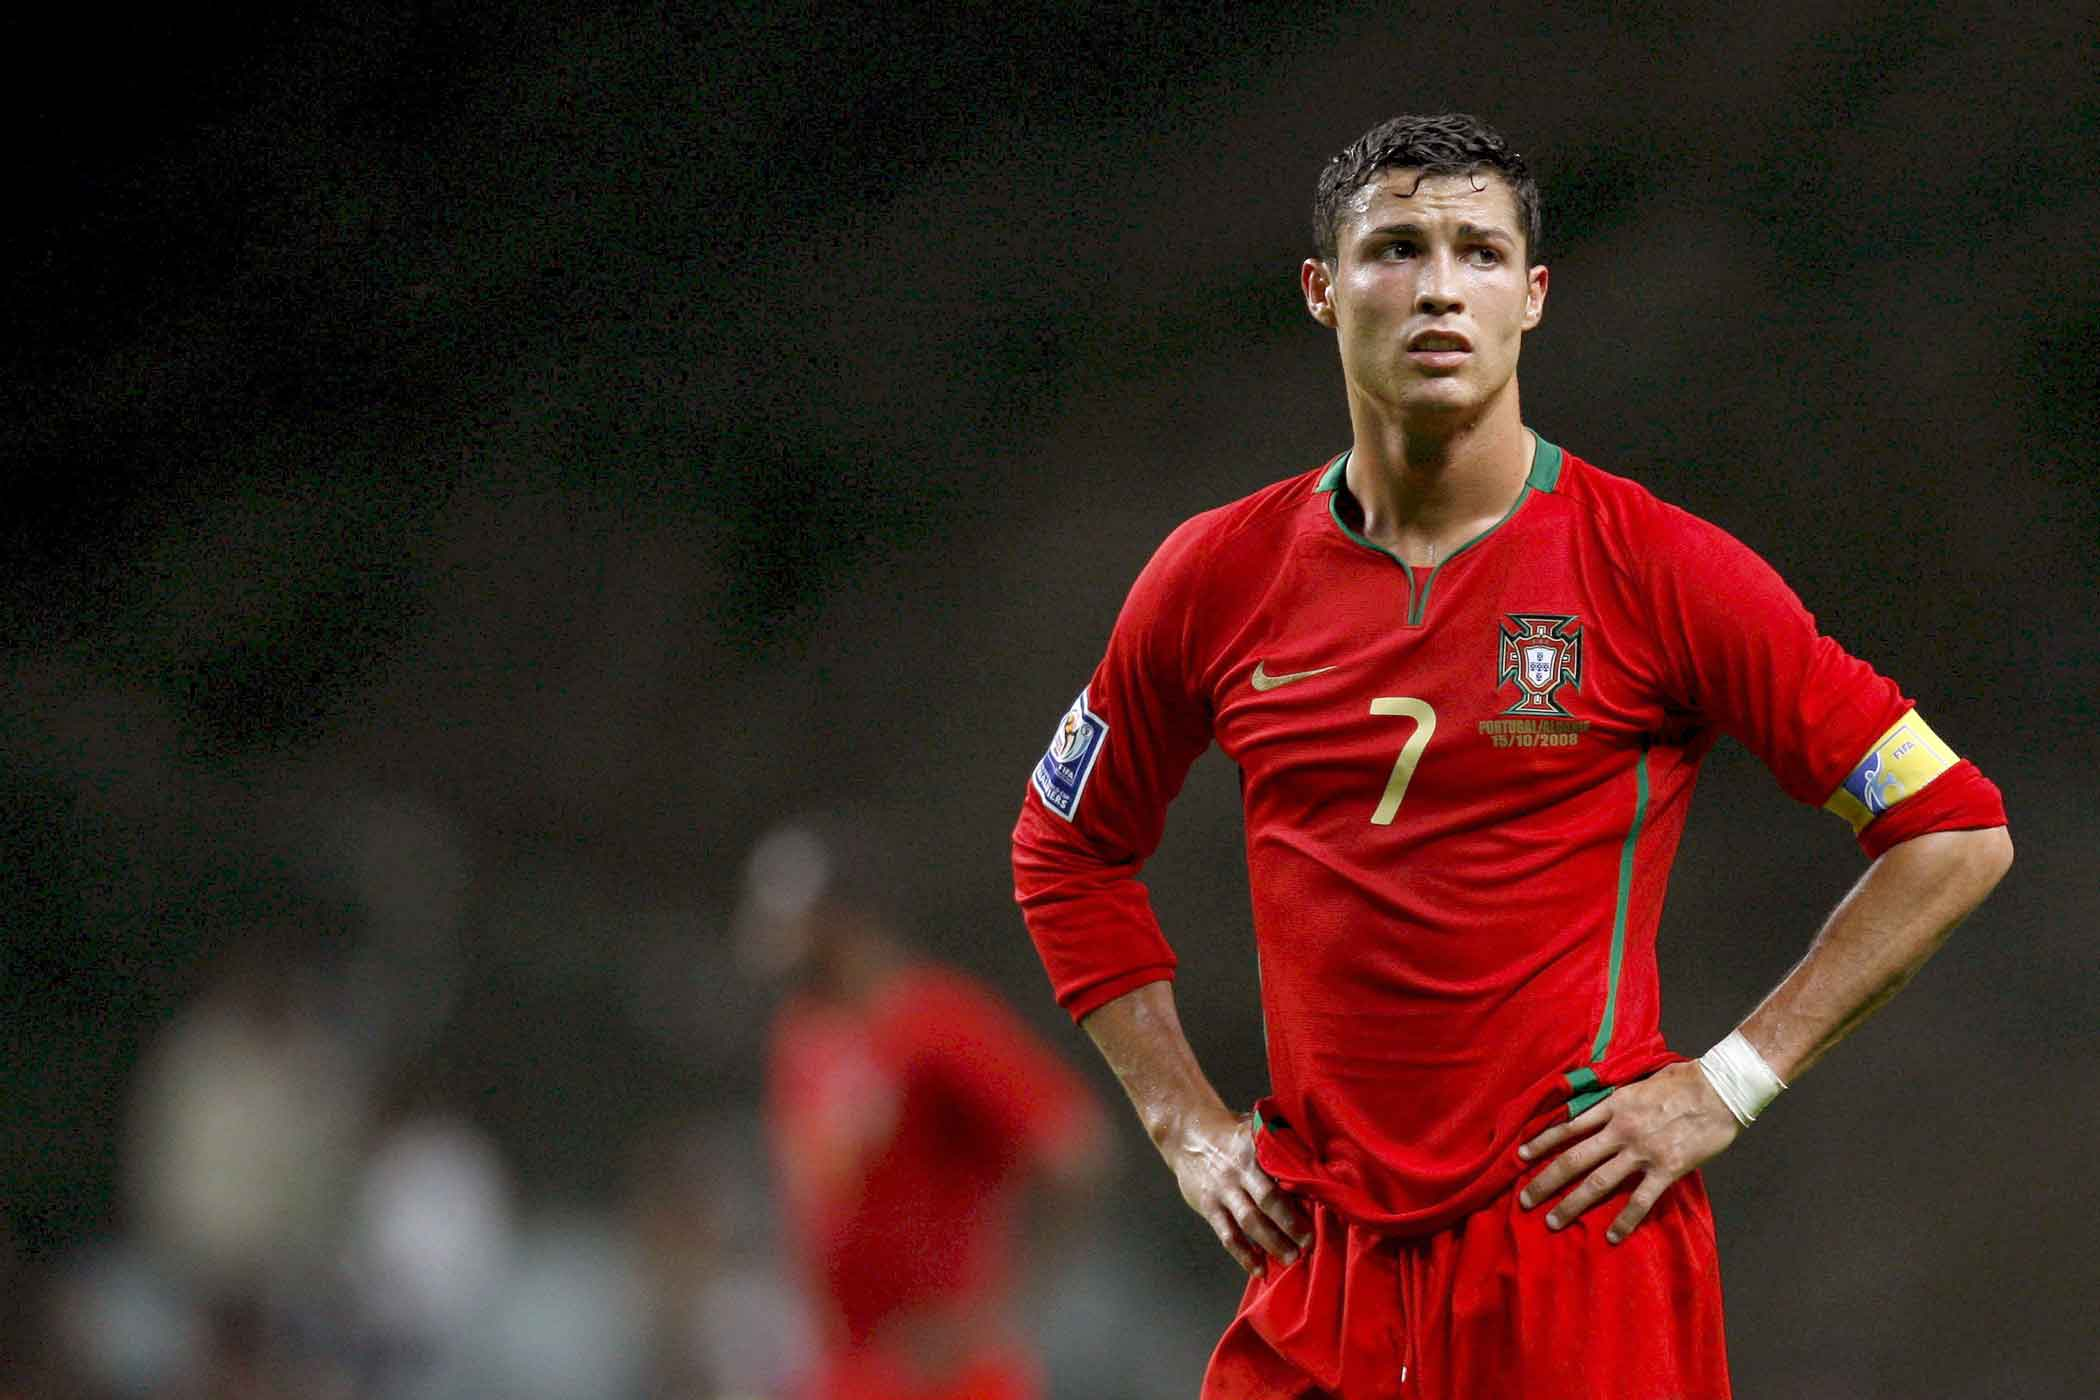 Portugal 1.364